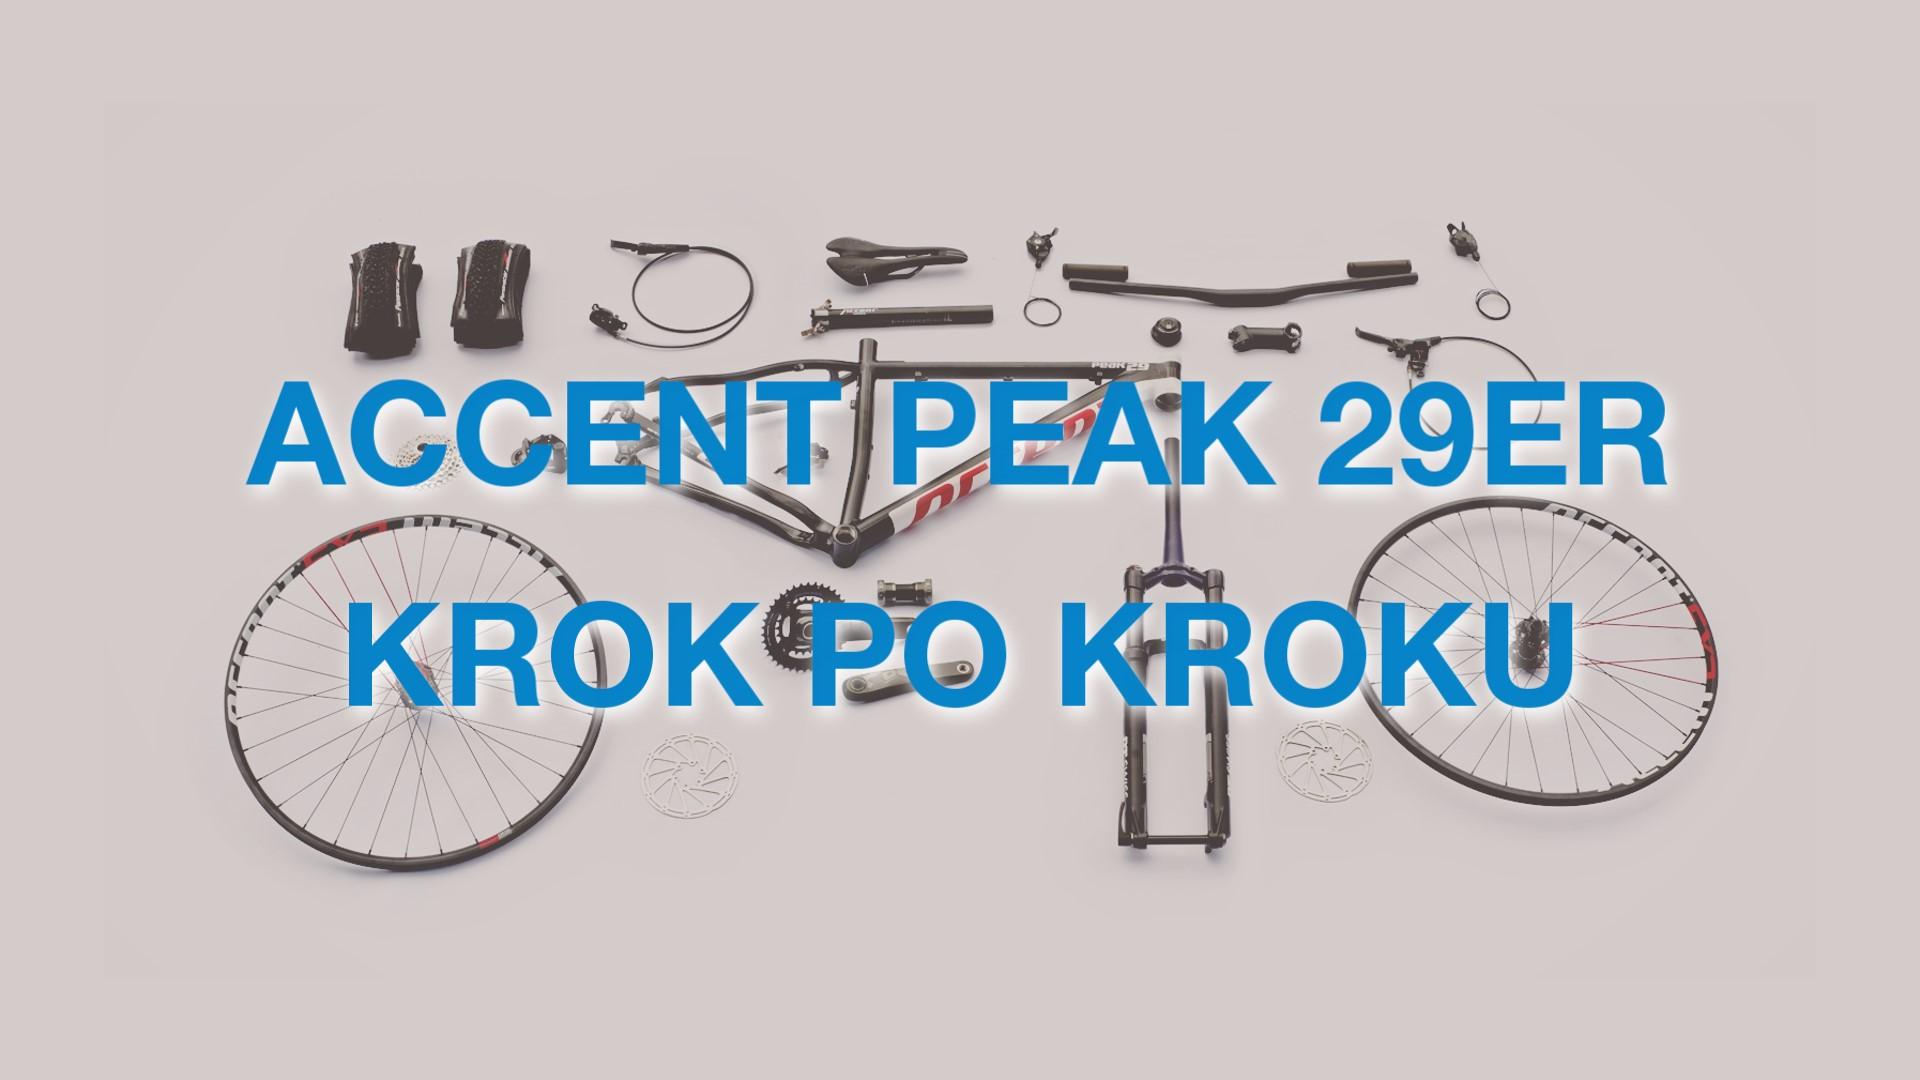 Accent Peak – 29er krok po kroku